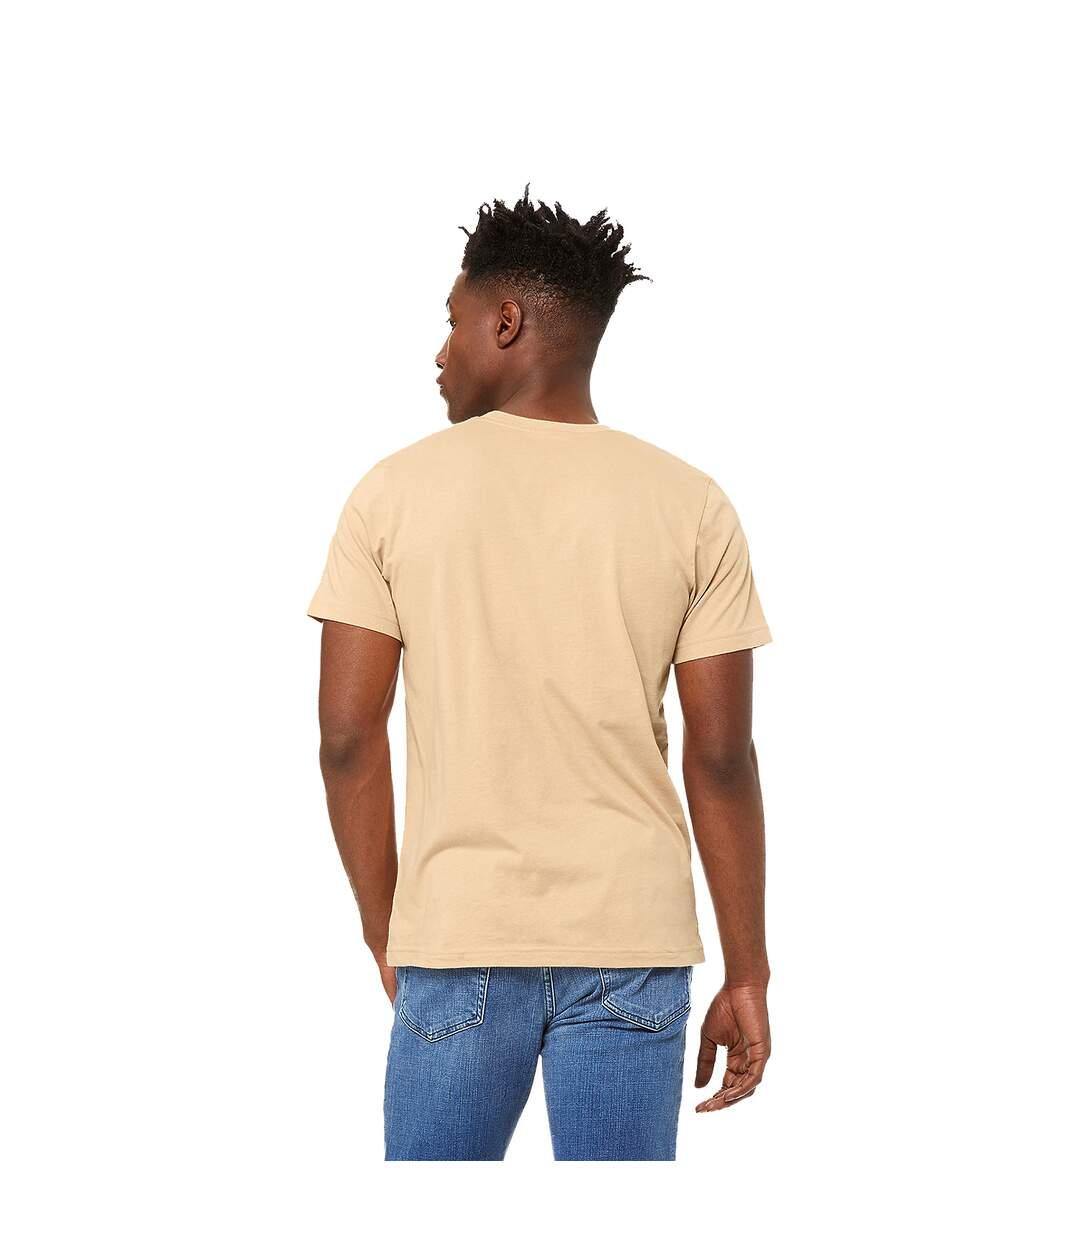 Canvas Unisex Jersey Crew Neck T-Shirt / Mens Short Sleeve T-Shirt (White) - UTBC163